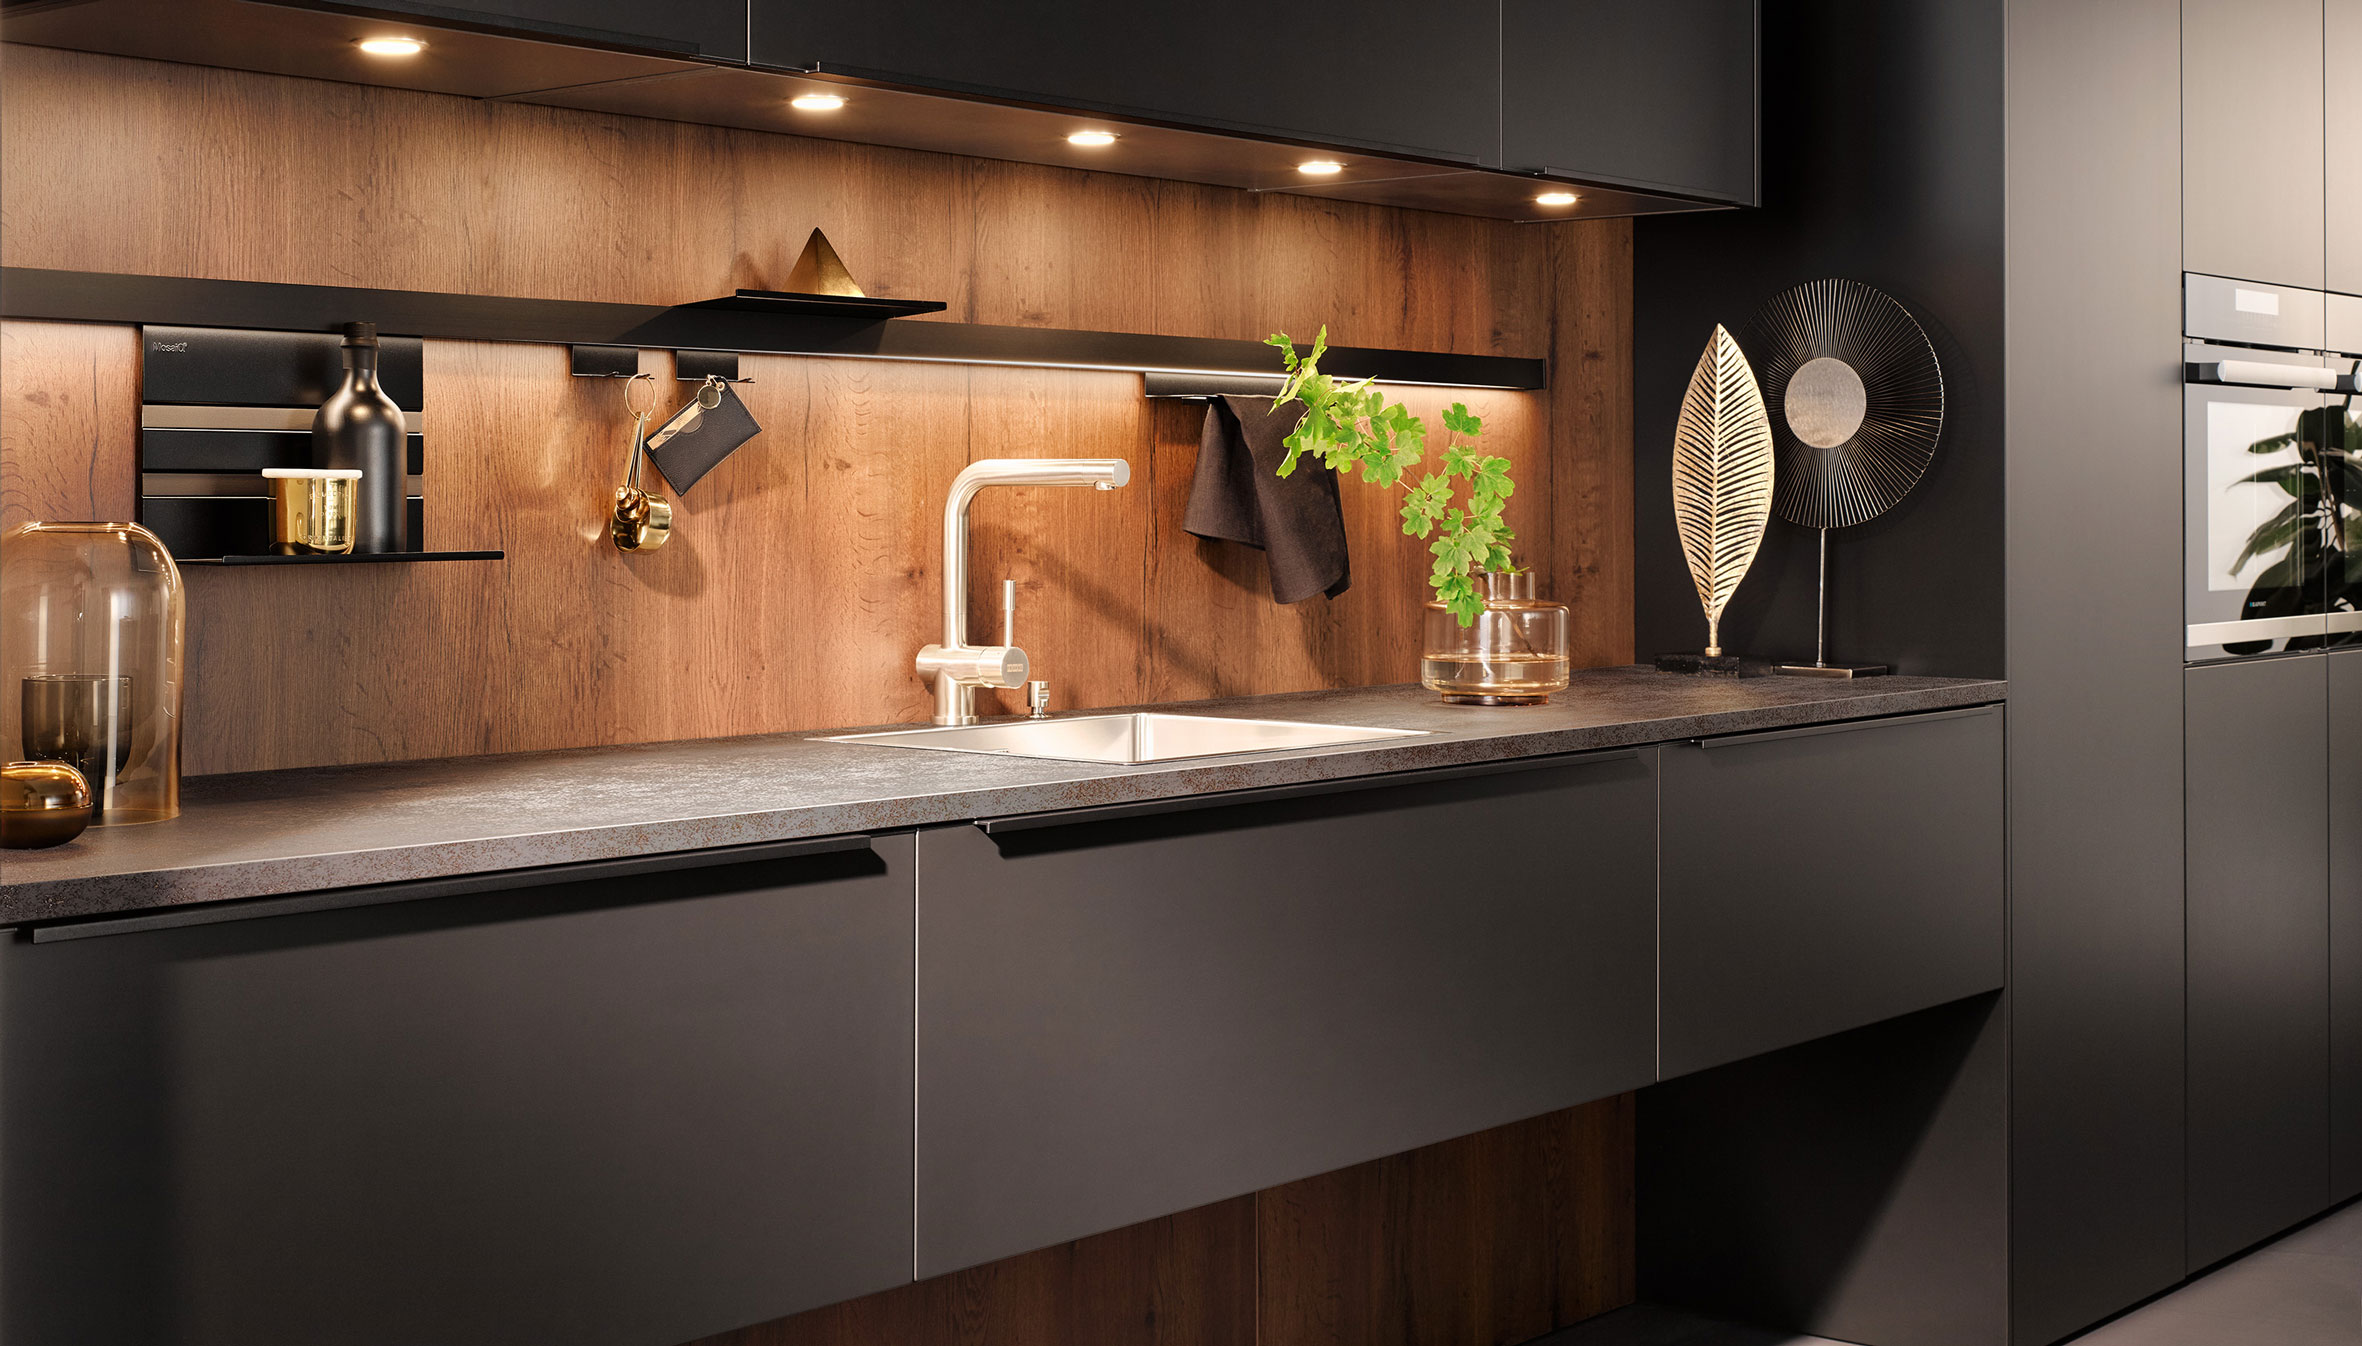 Houten achterwand | Keukenwanden | Satink Keukens